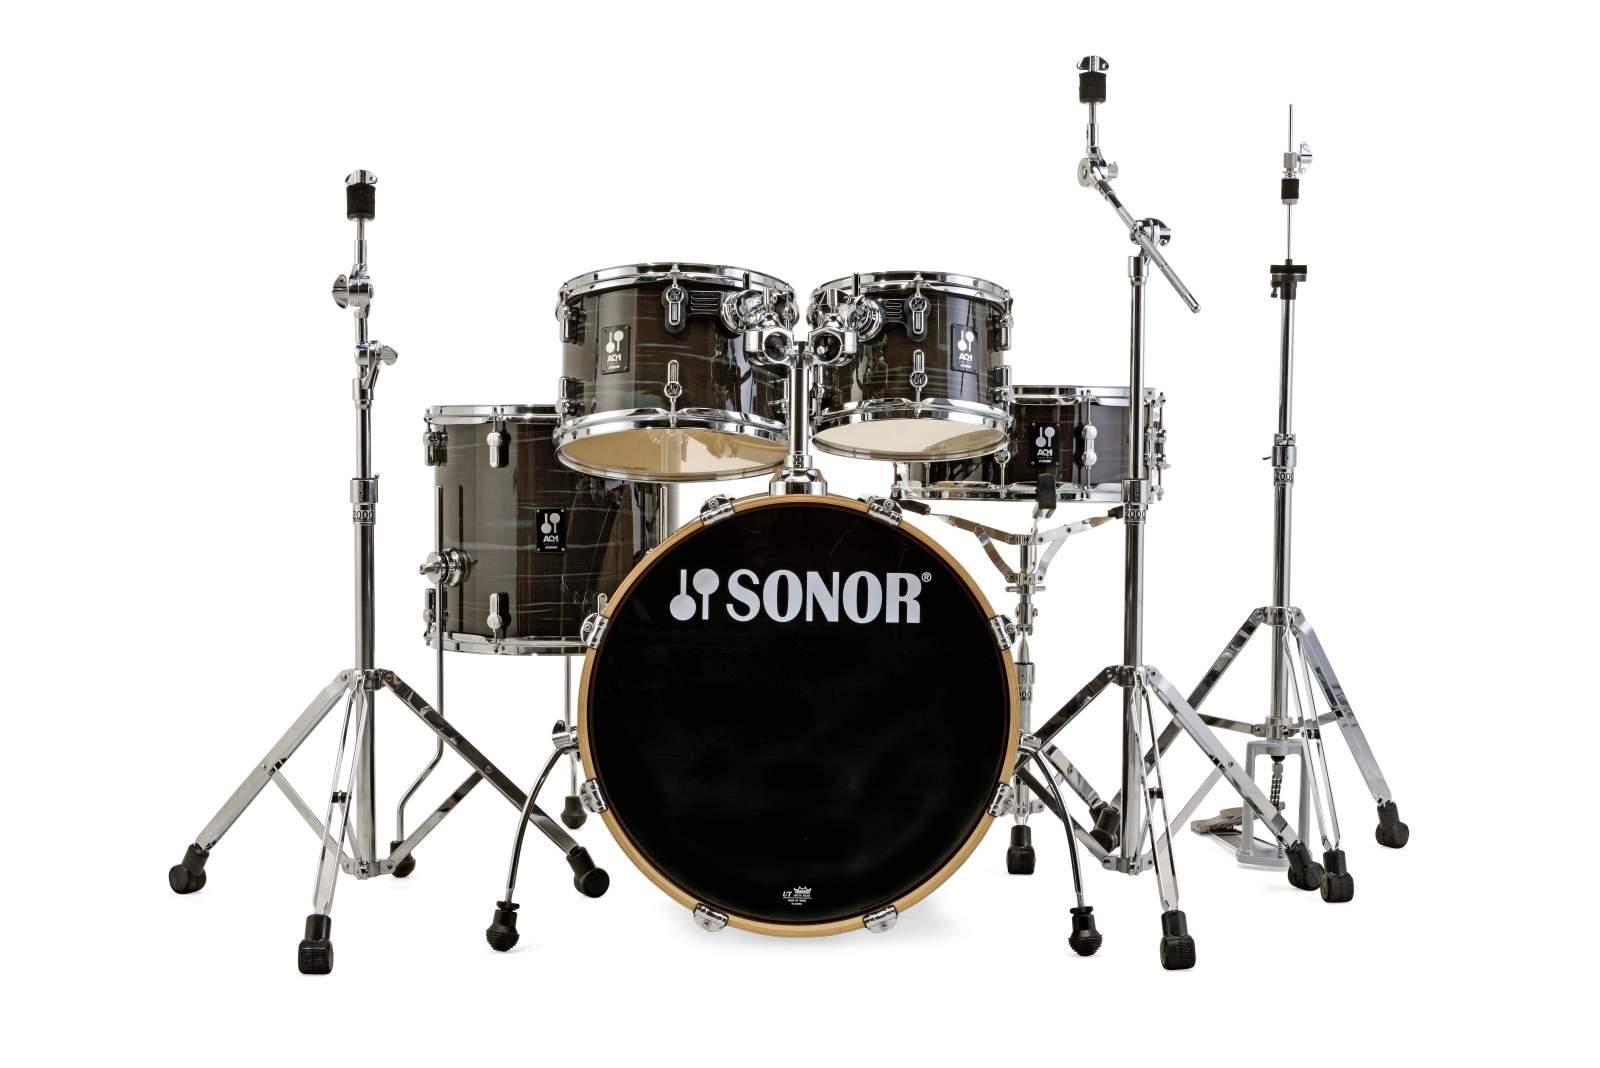 Sonor AQ1 Stage Set WB